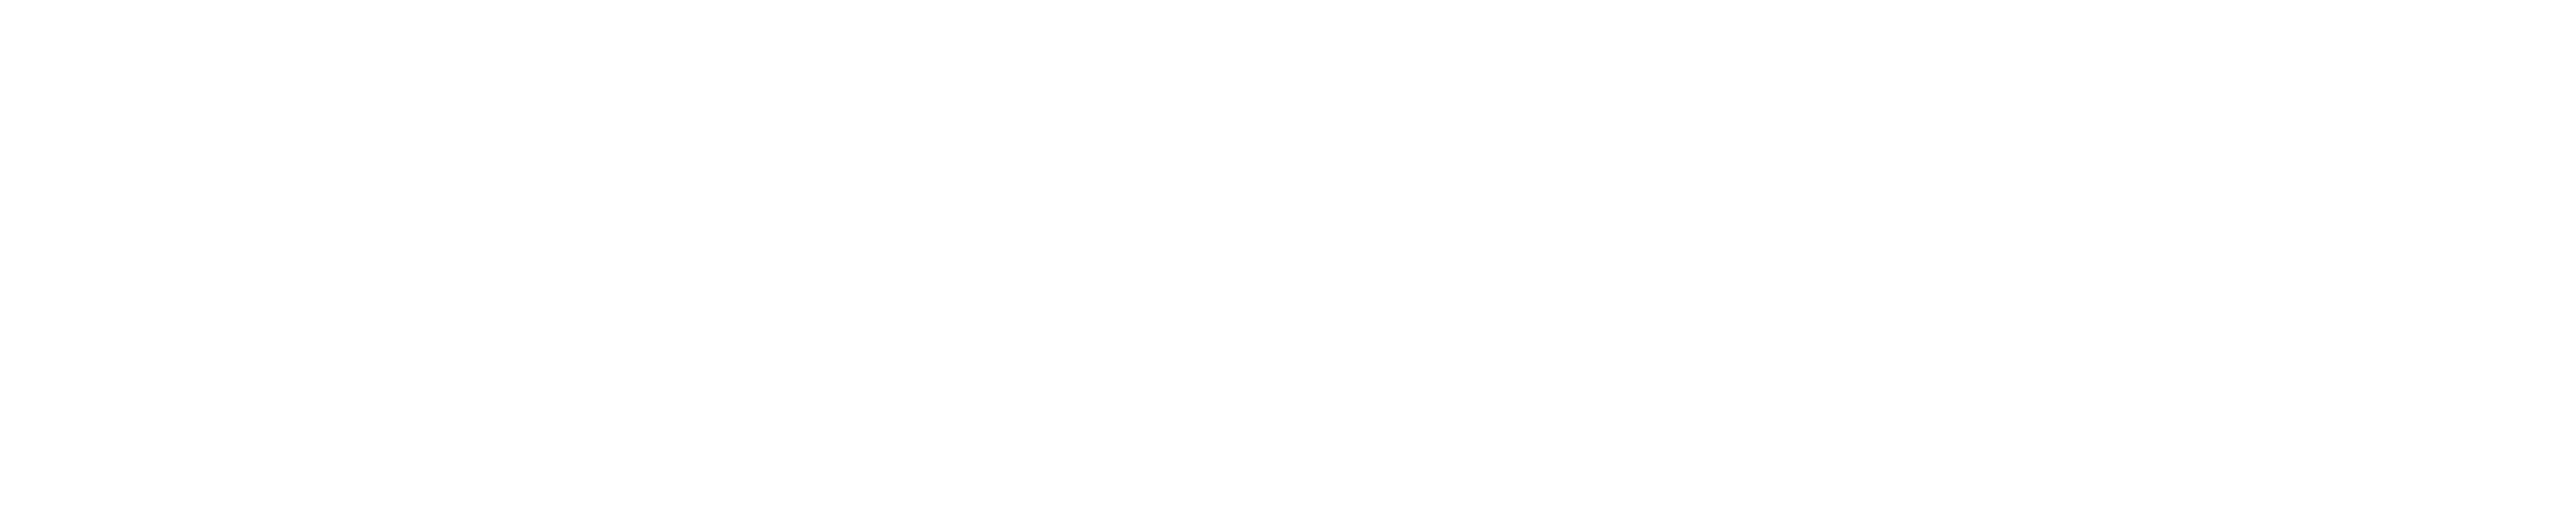 Powered by SDM Analytics Inc